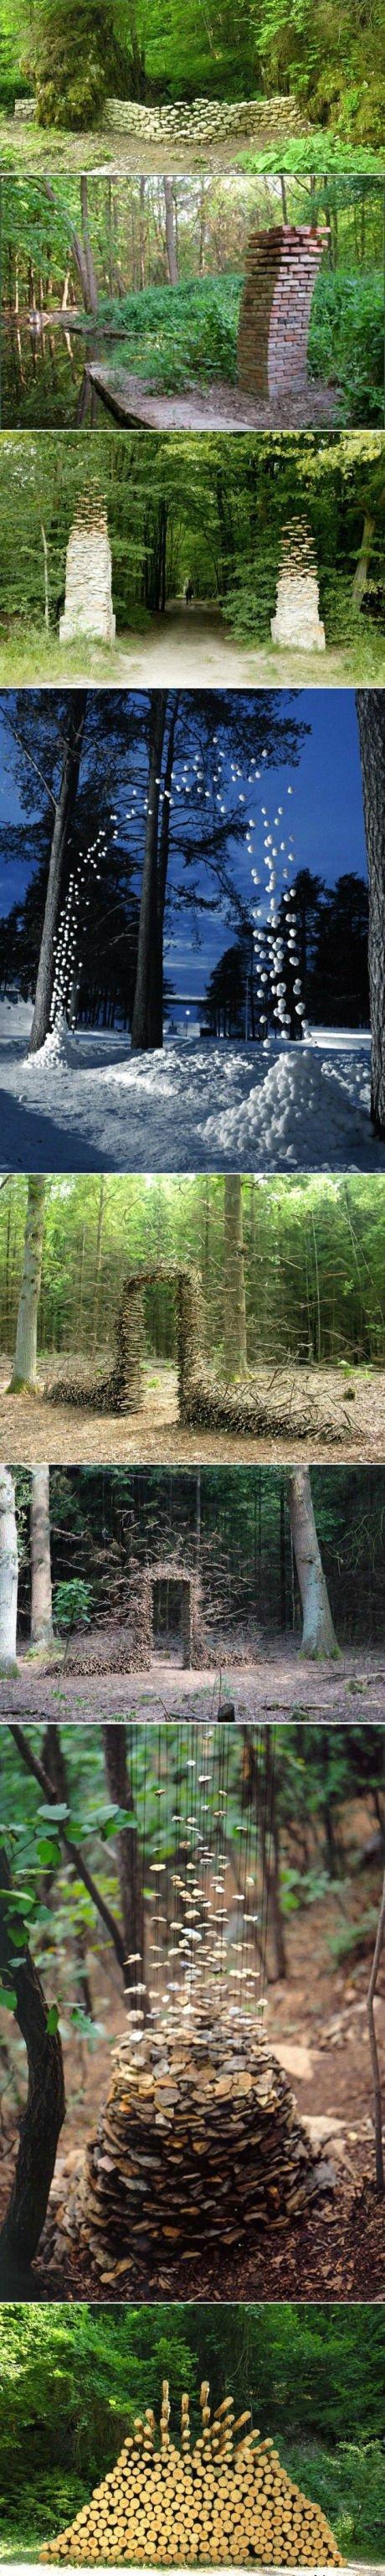 Gravity-Defying Sculptures. .. seems legit